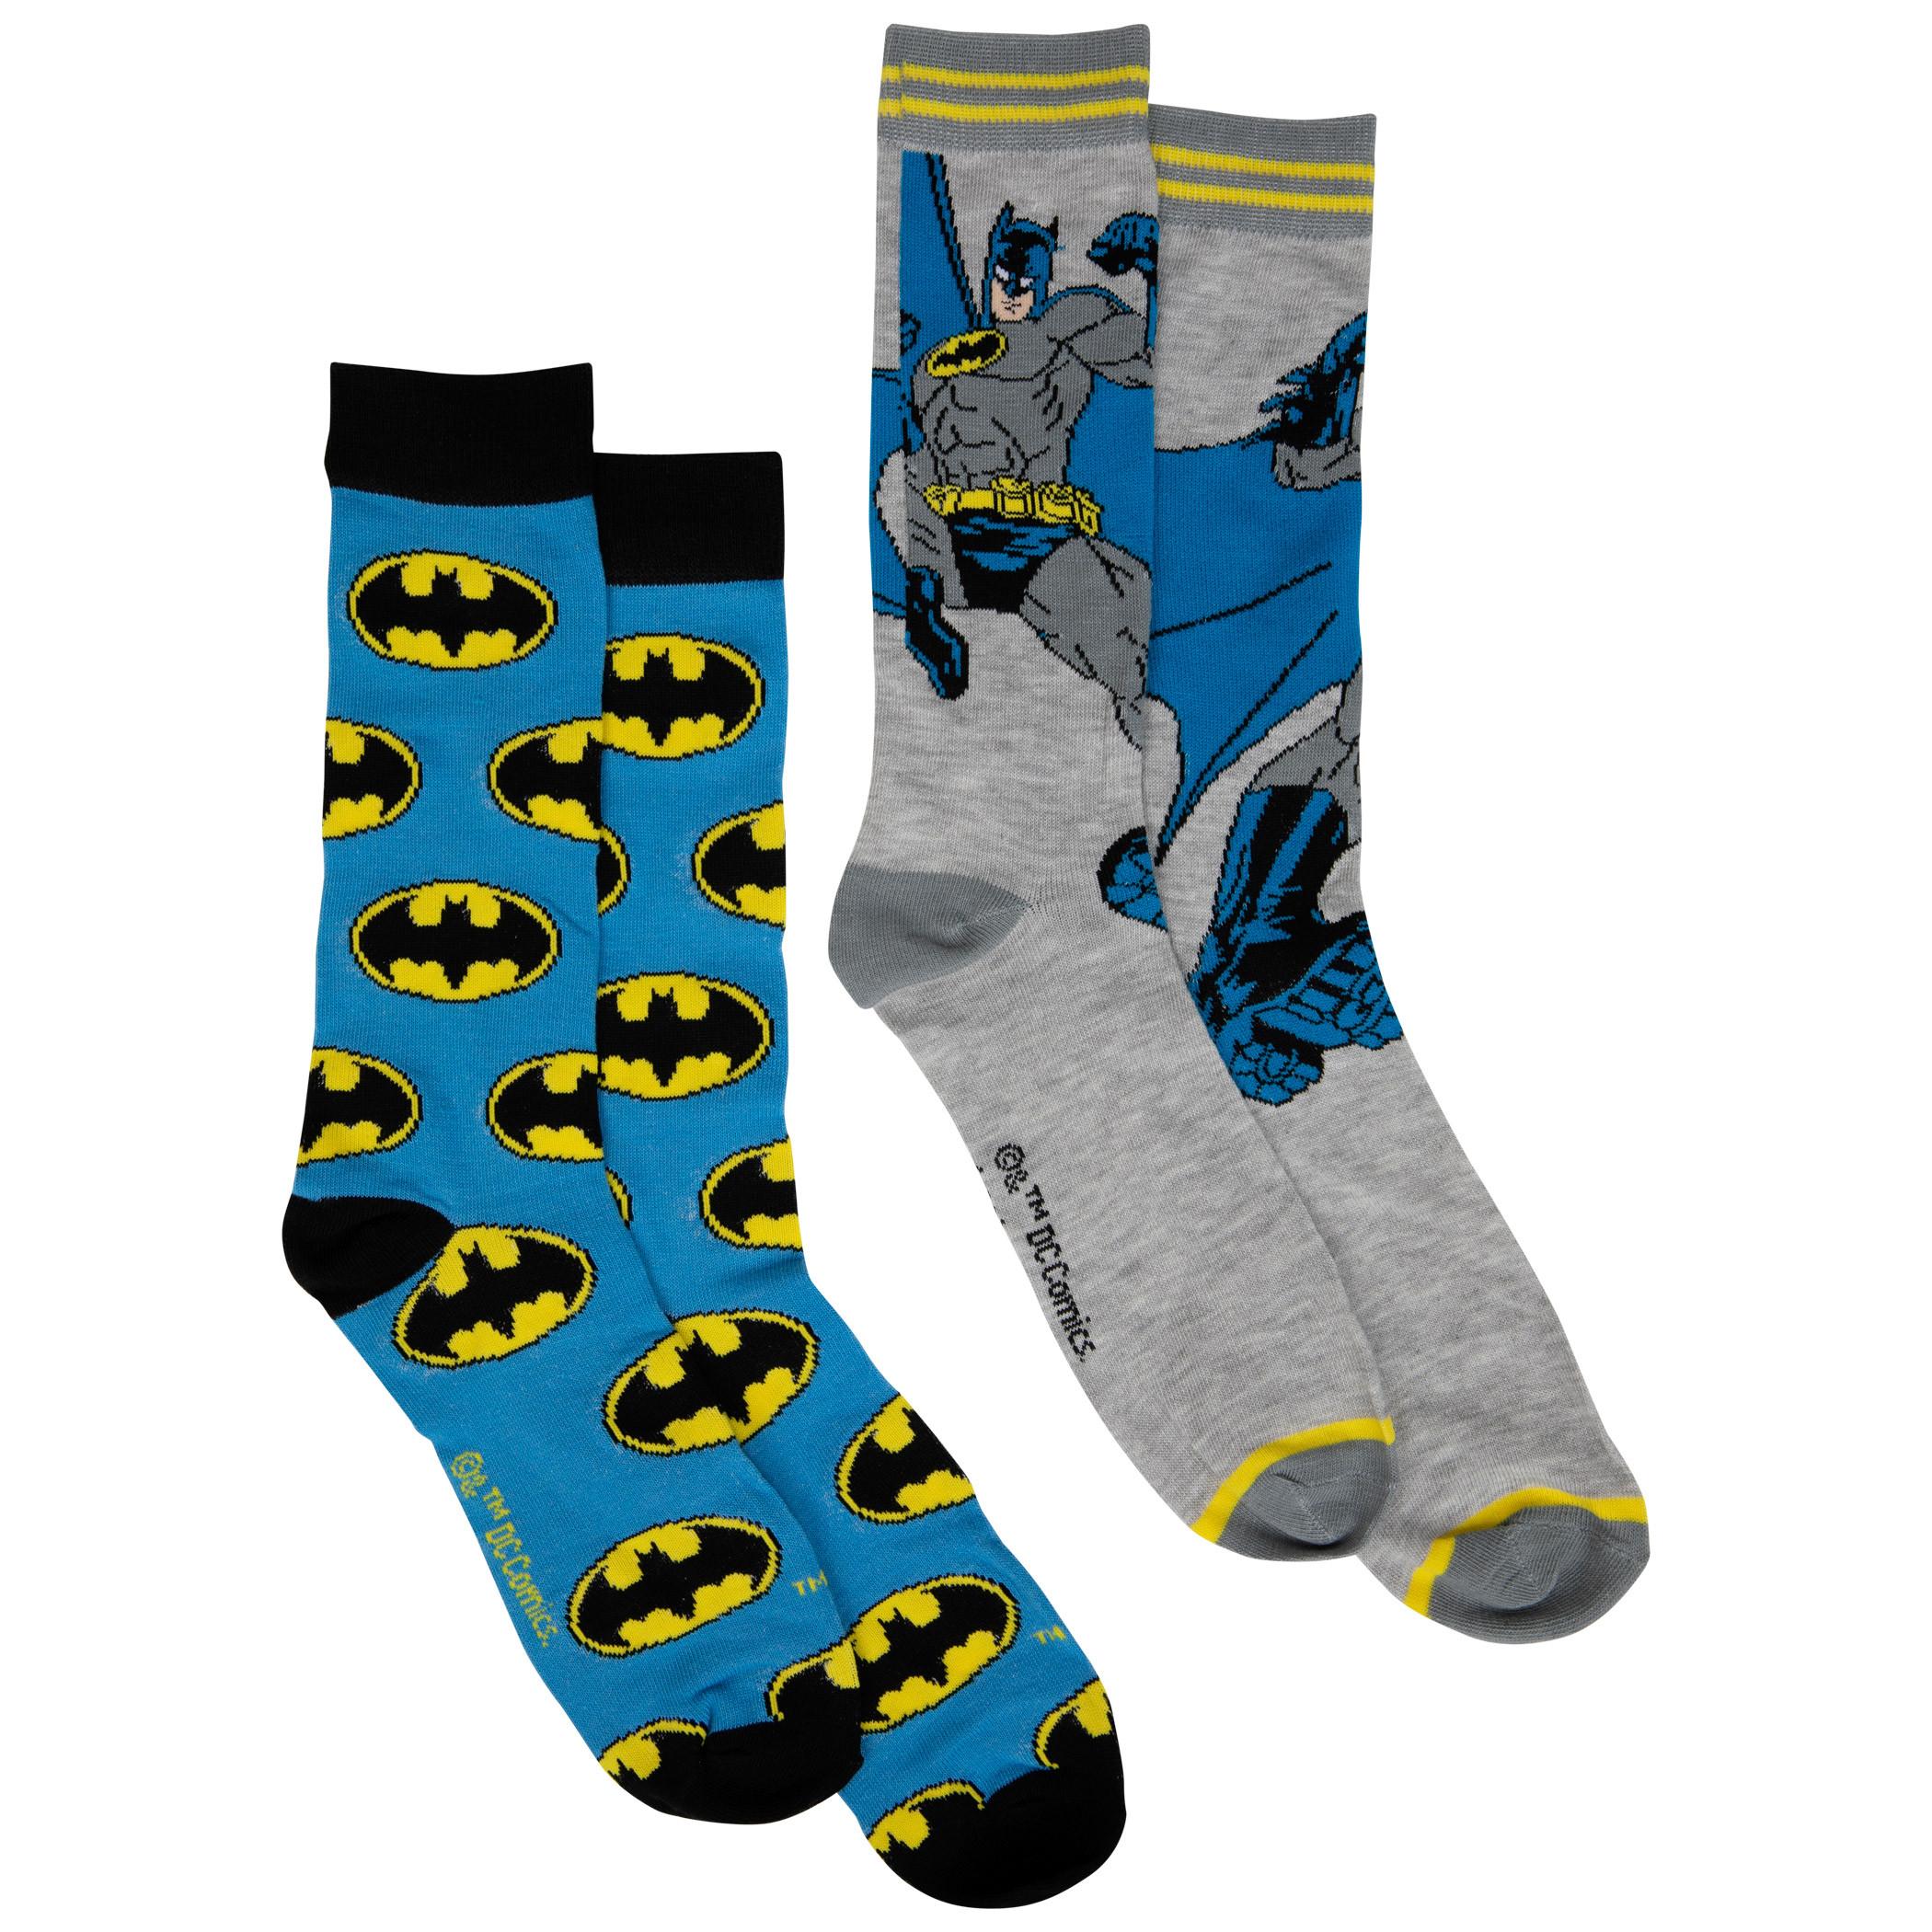 Batman Classic Logos and Character 2-Pair Pack of Crew Socks